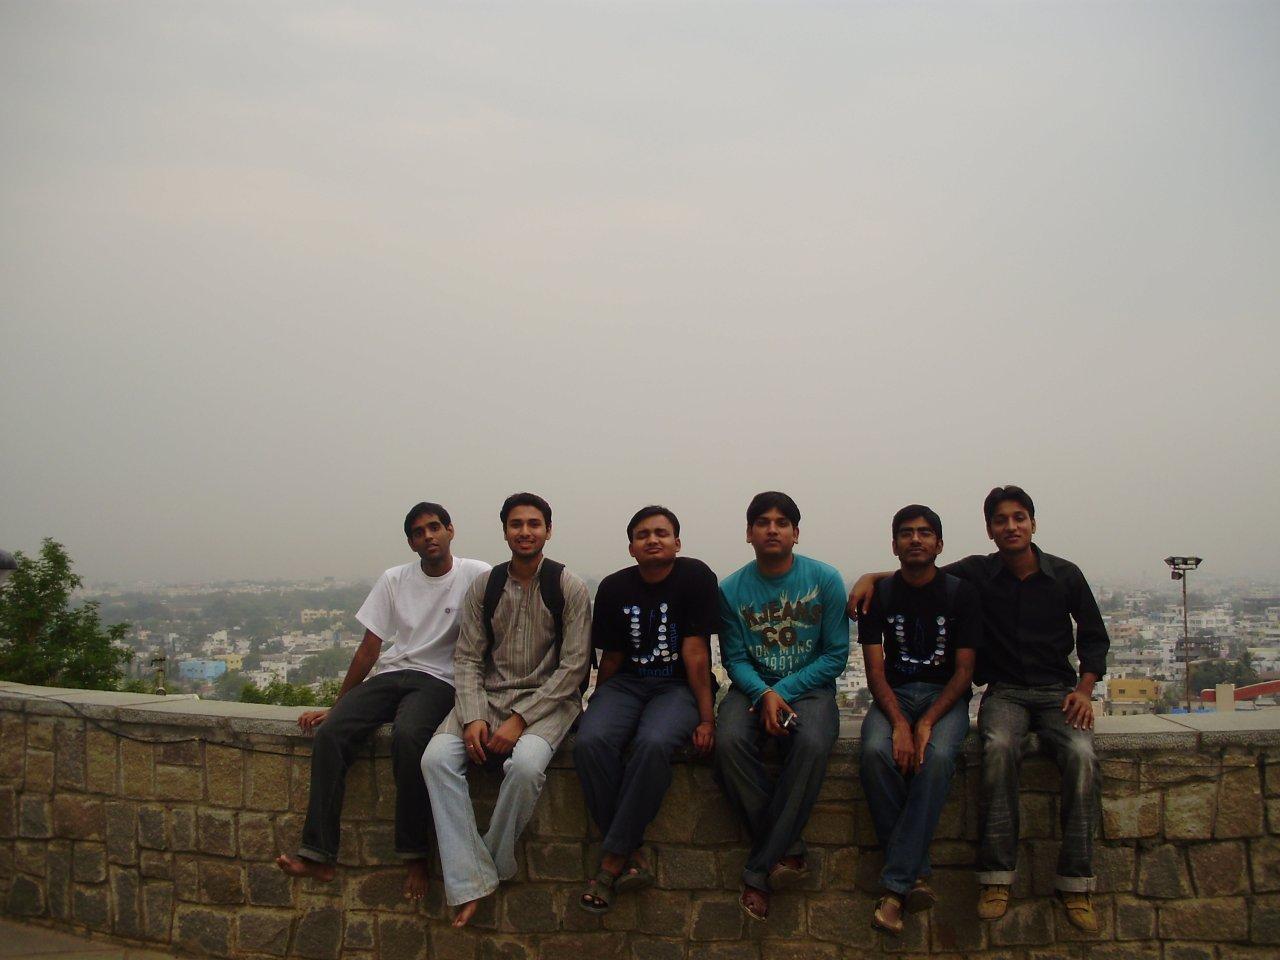 Sashidhar, Aditya, Yogendra, Aakash, Me and Nitin